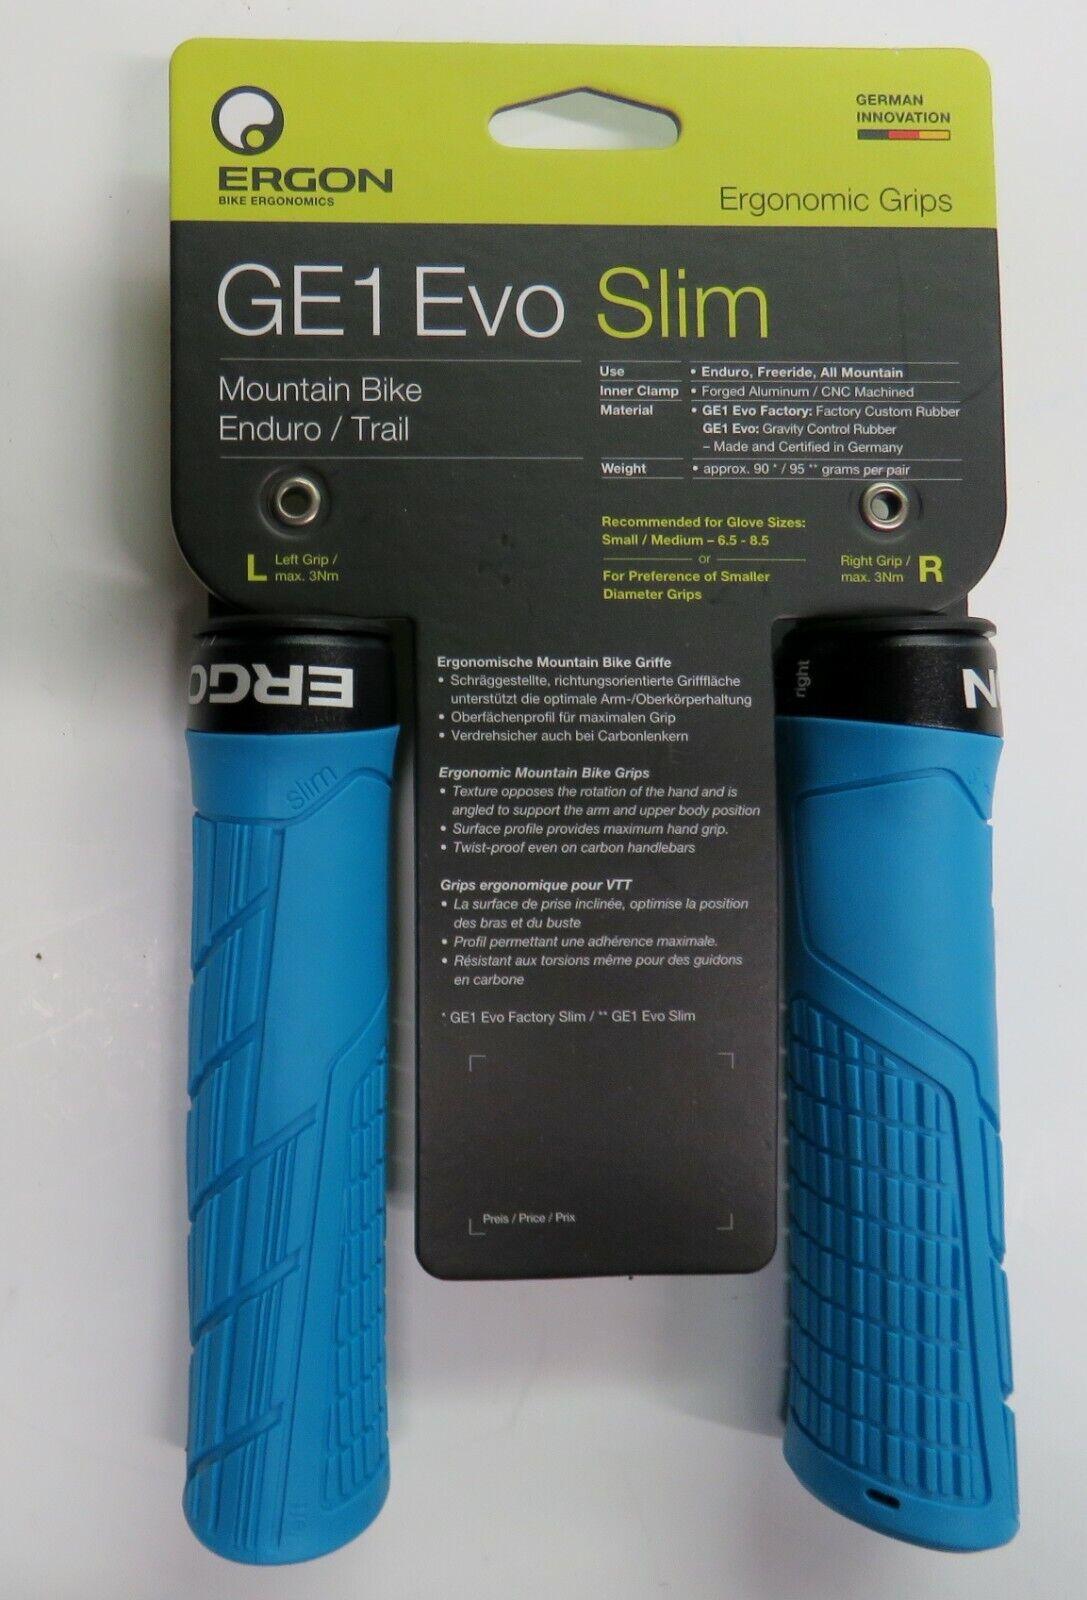 7 Color Options GE1 Evo Ergonomic Lock-on Bicycle Handlebar Grips Regular or Slim Fit for Mountain Ergon Trail and Enduro Bikes